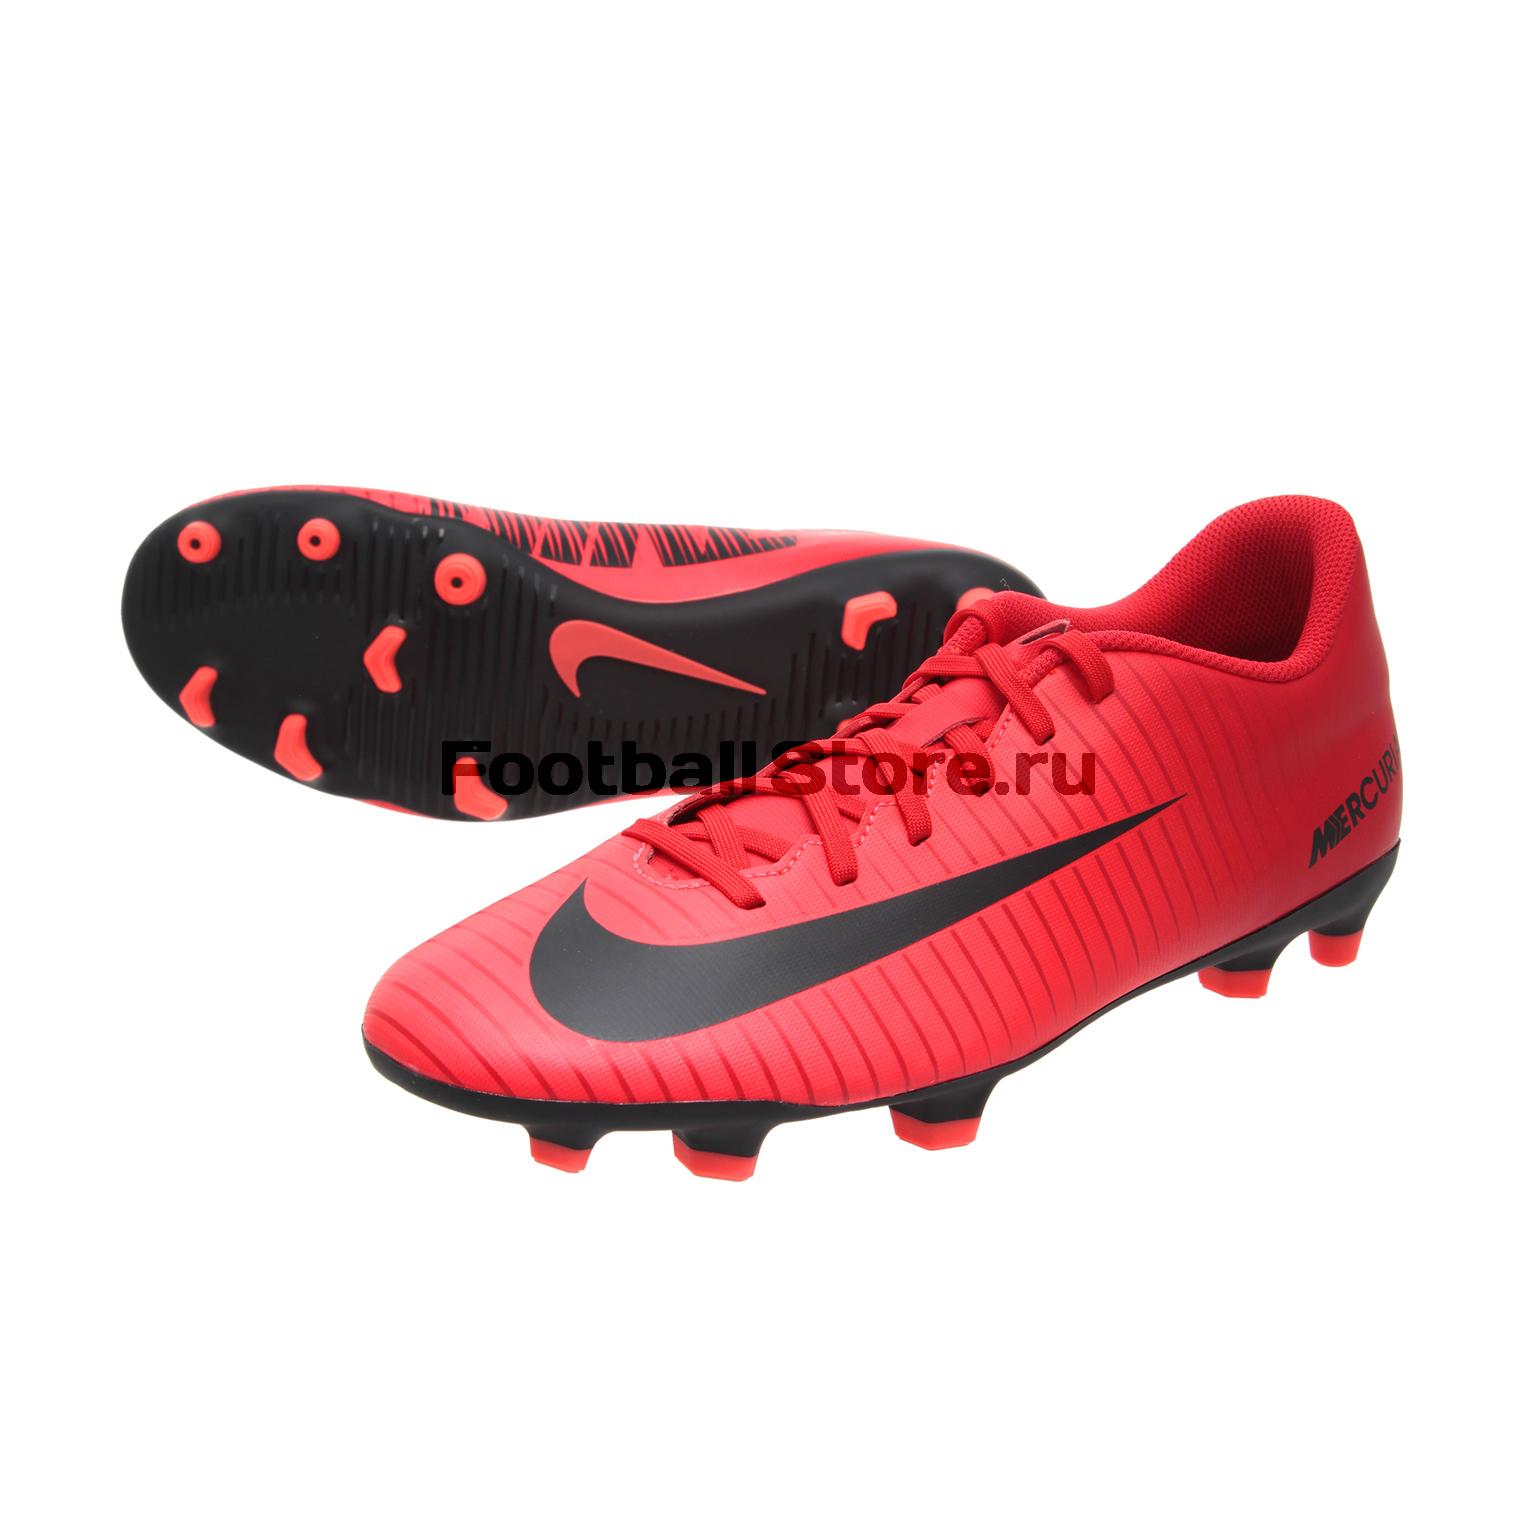 Игровые бутсы Nike Бутсы Nike Mercurial Vortex III FG 831969-616 nike nike mercurial lite